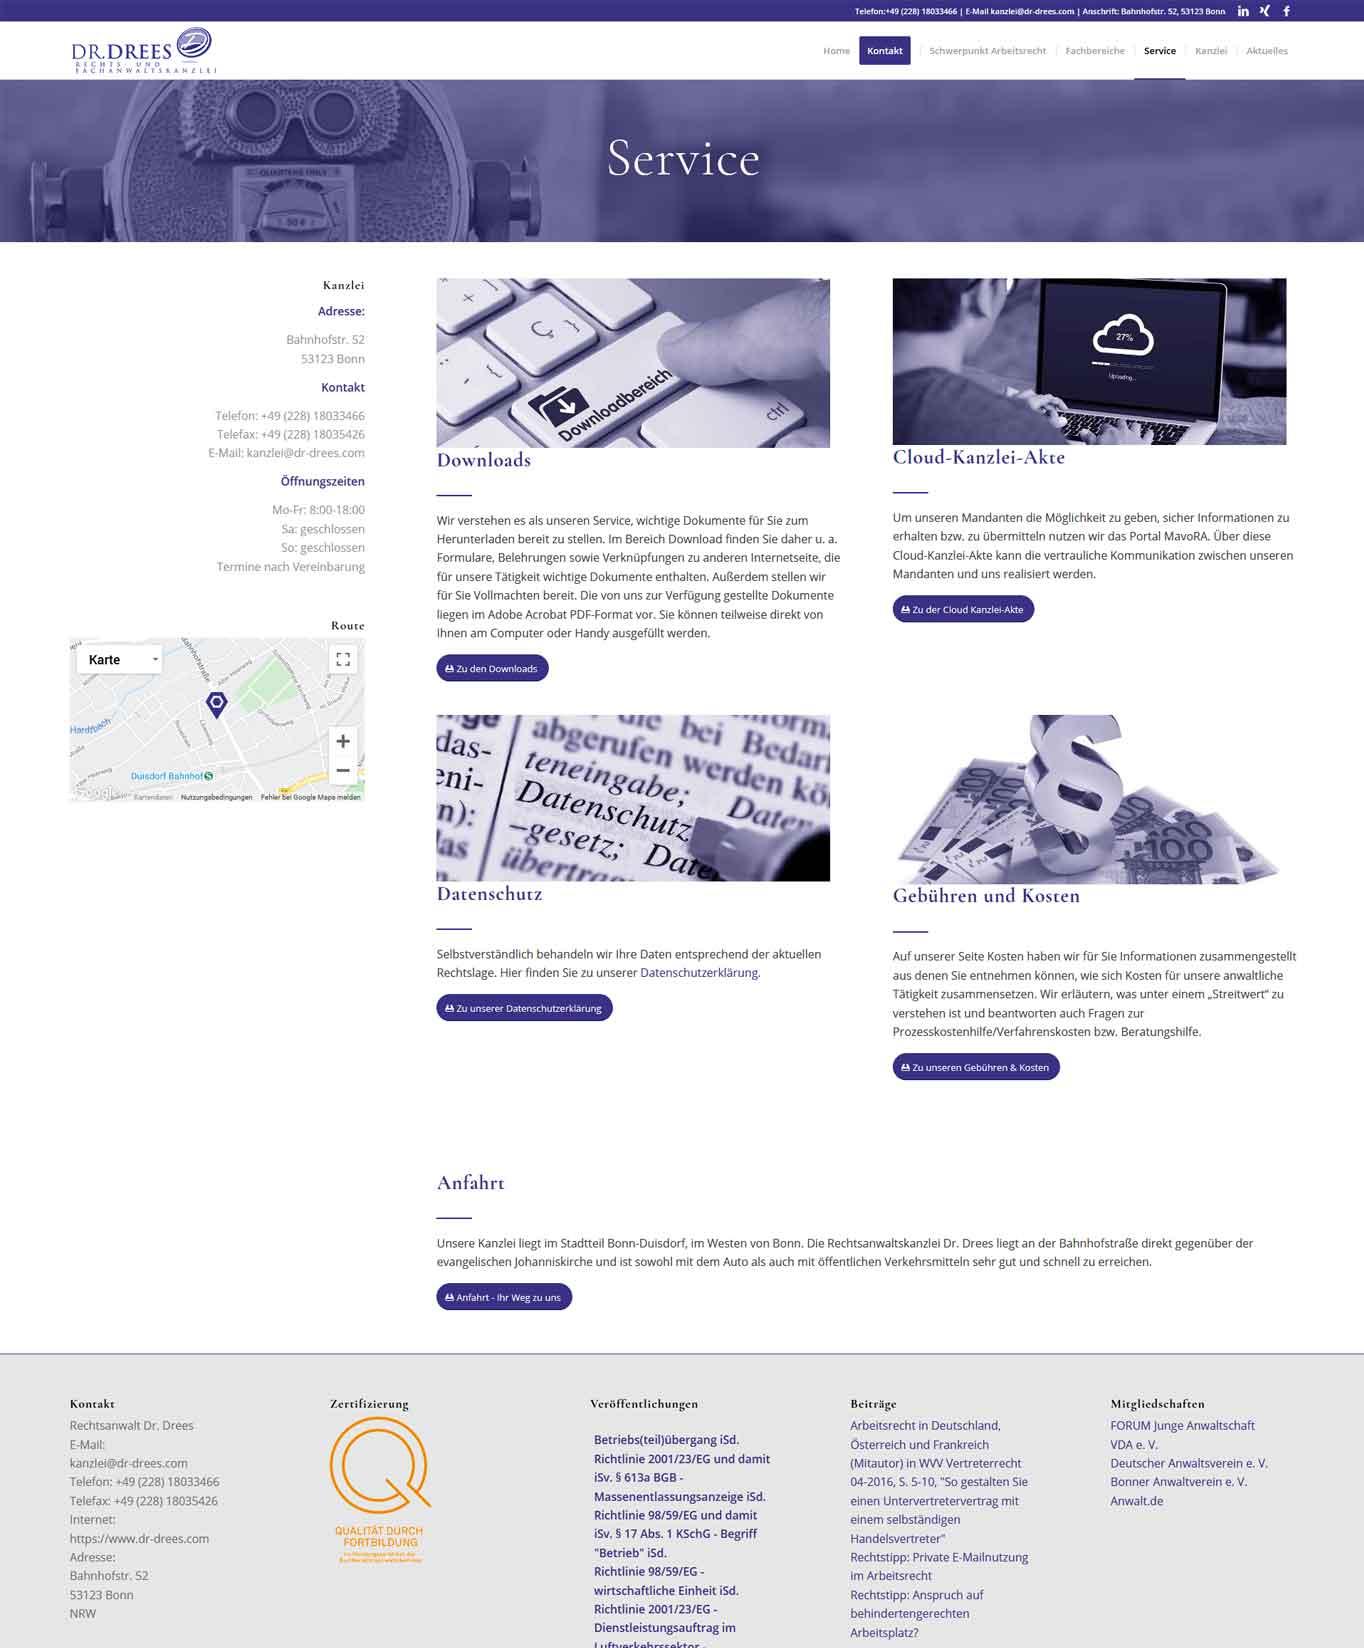 Dr Drees Service Webdesign Rechtsanwaltskanzlei Dr. Drees JF Mediendesign